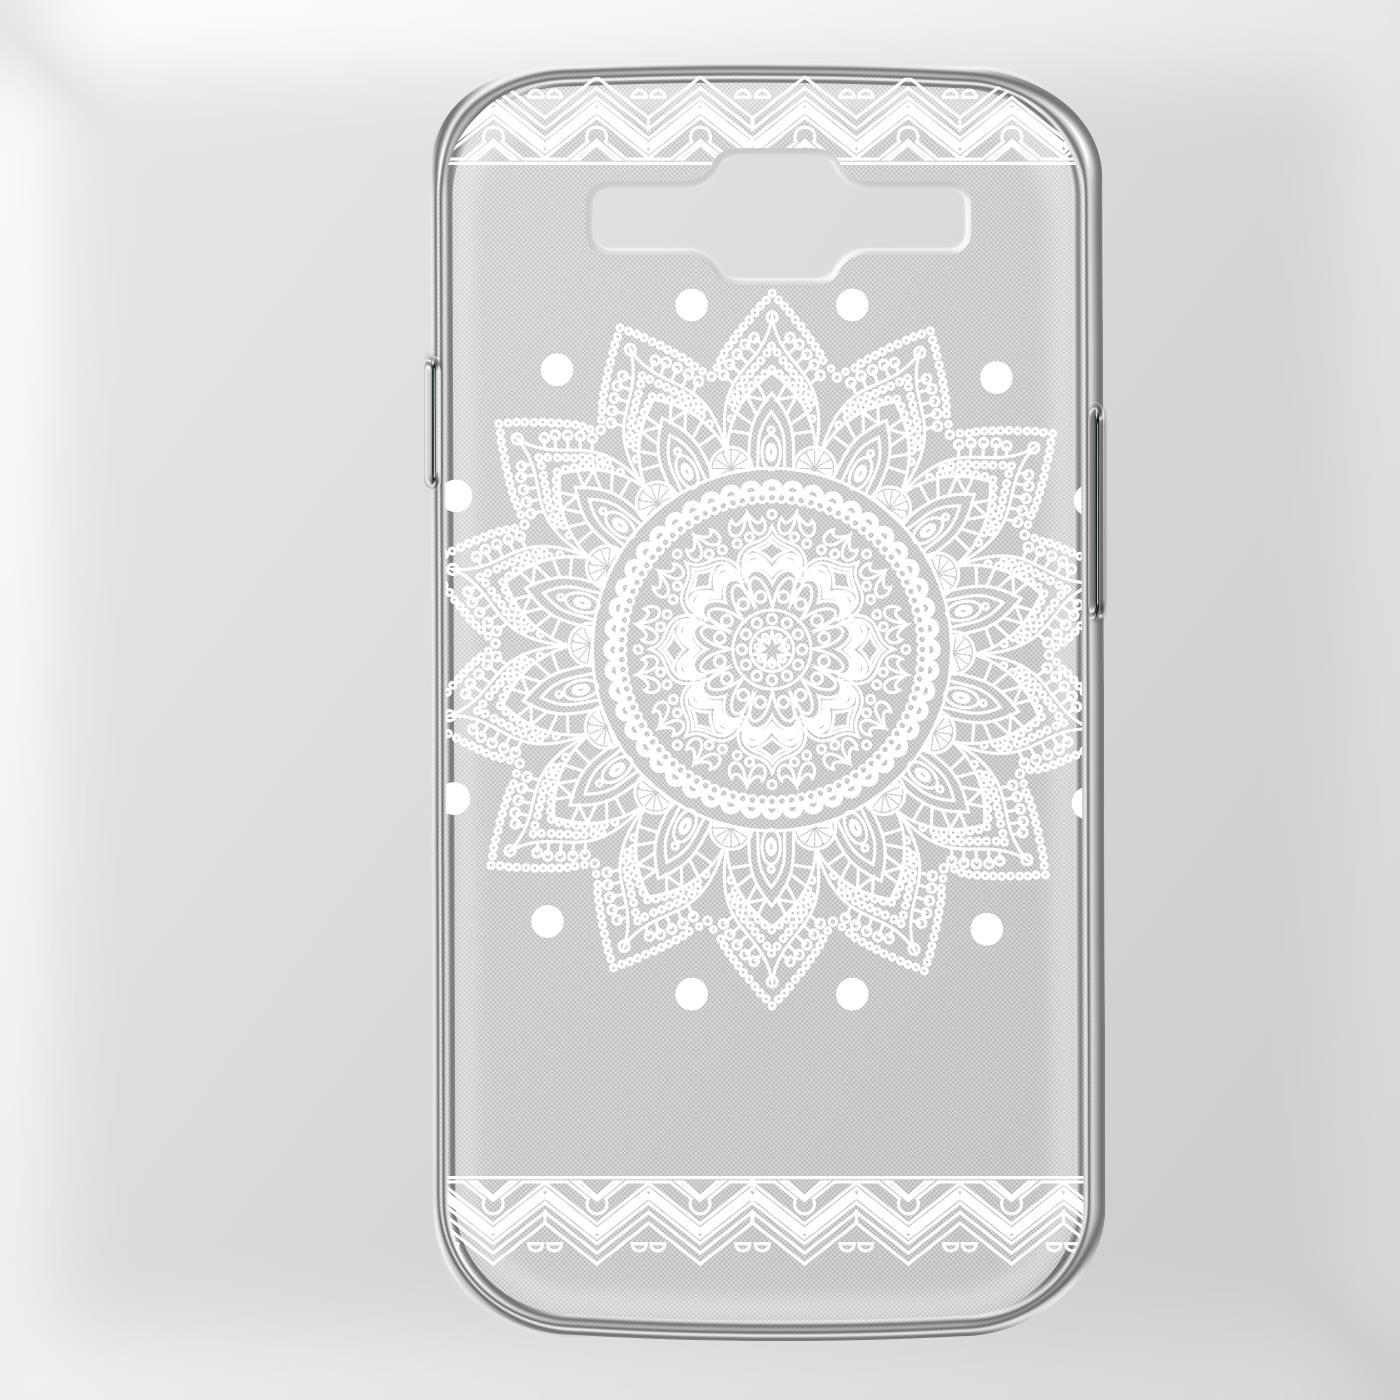 Samsung-Galaxy-S3-Neo-Handy-Schutz-Huelle-Case-TPU-Silikon-Cover-Tasche-Mandala Indexbild 13